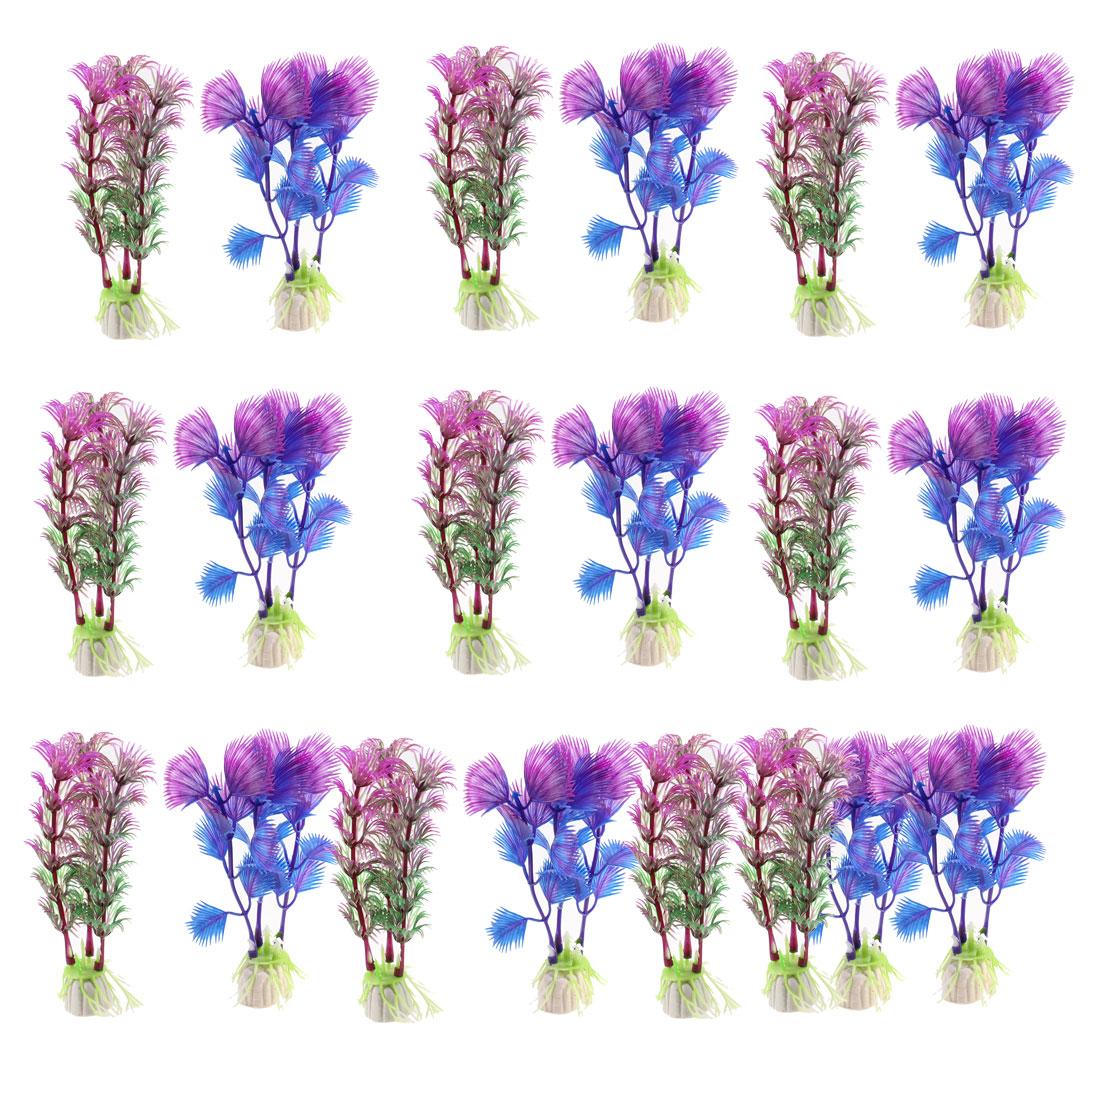 20pcs Purple Blue Plastic Artificial Aquarium Plant Aquatic Grass Decor w Ceramic Base for Fish Tank